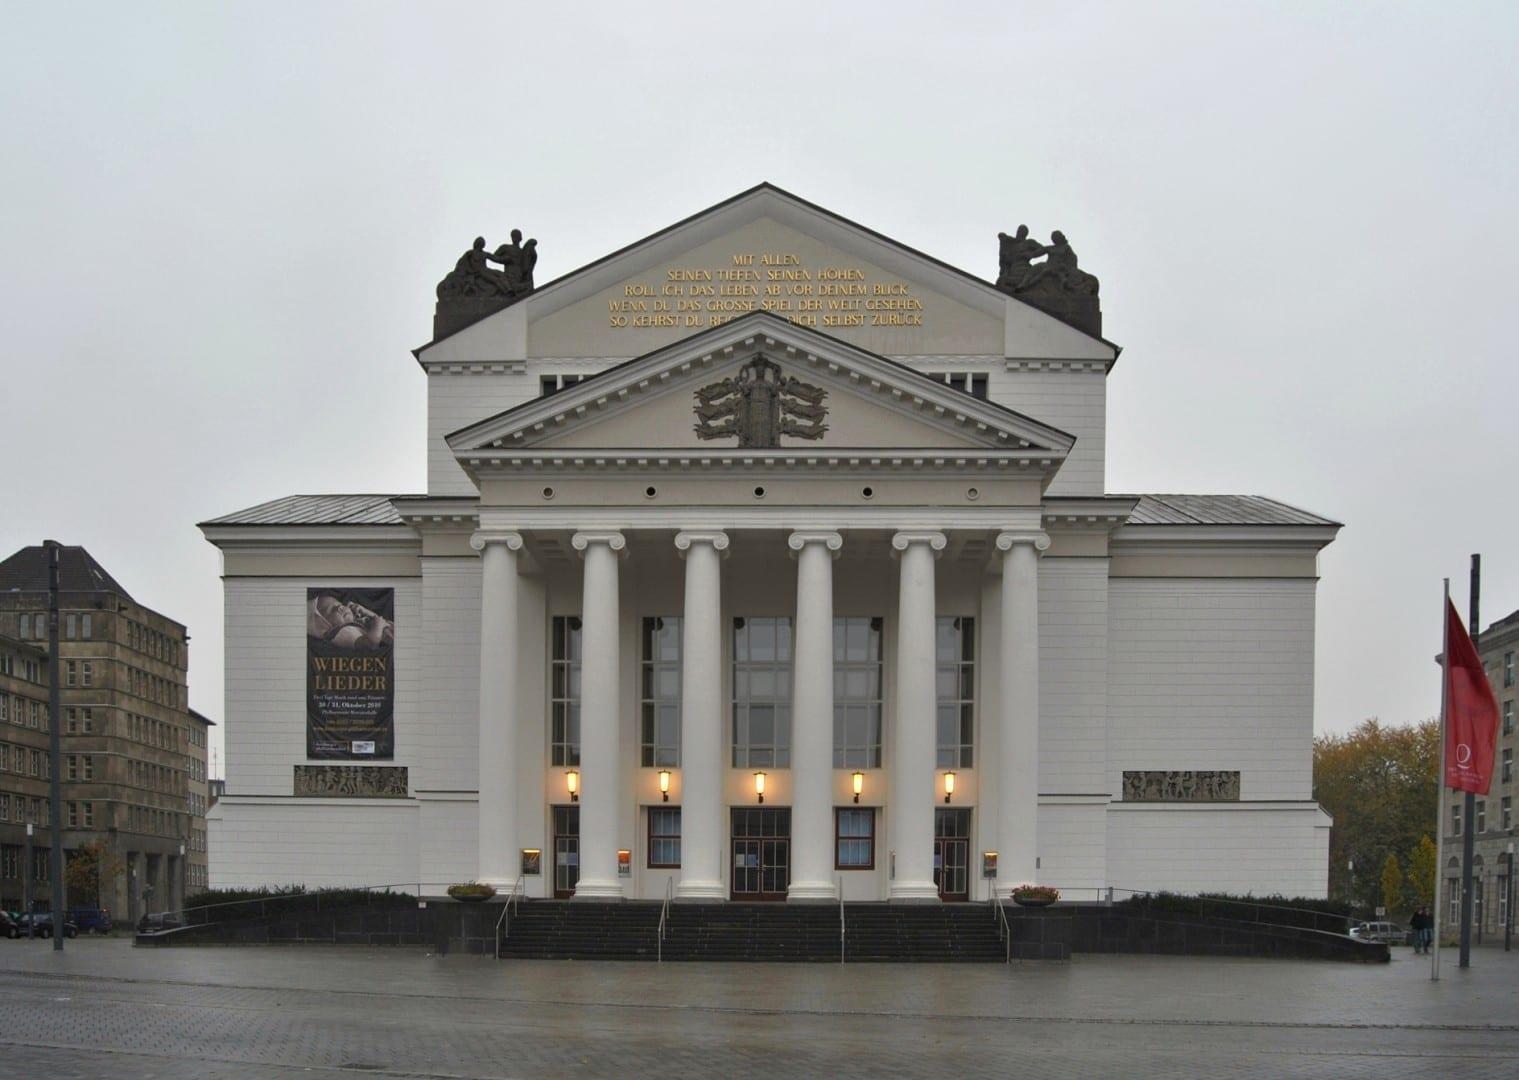 El Teatro Duisburg, que alberga la Deutsche Oper am Rhein (ópera) y la Orquesta Filarmónica de Duisburg Duisburg Alemania